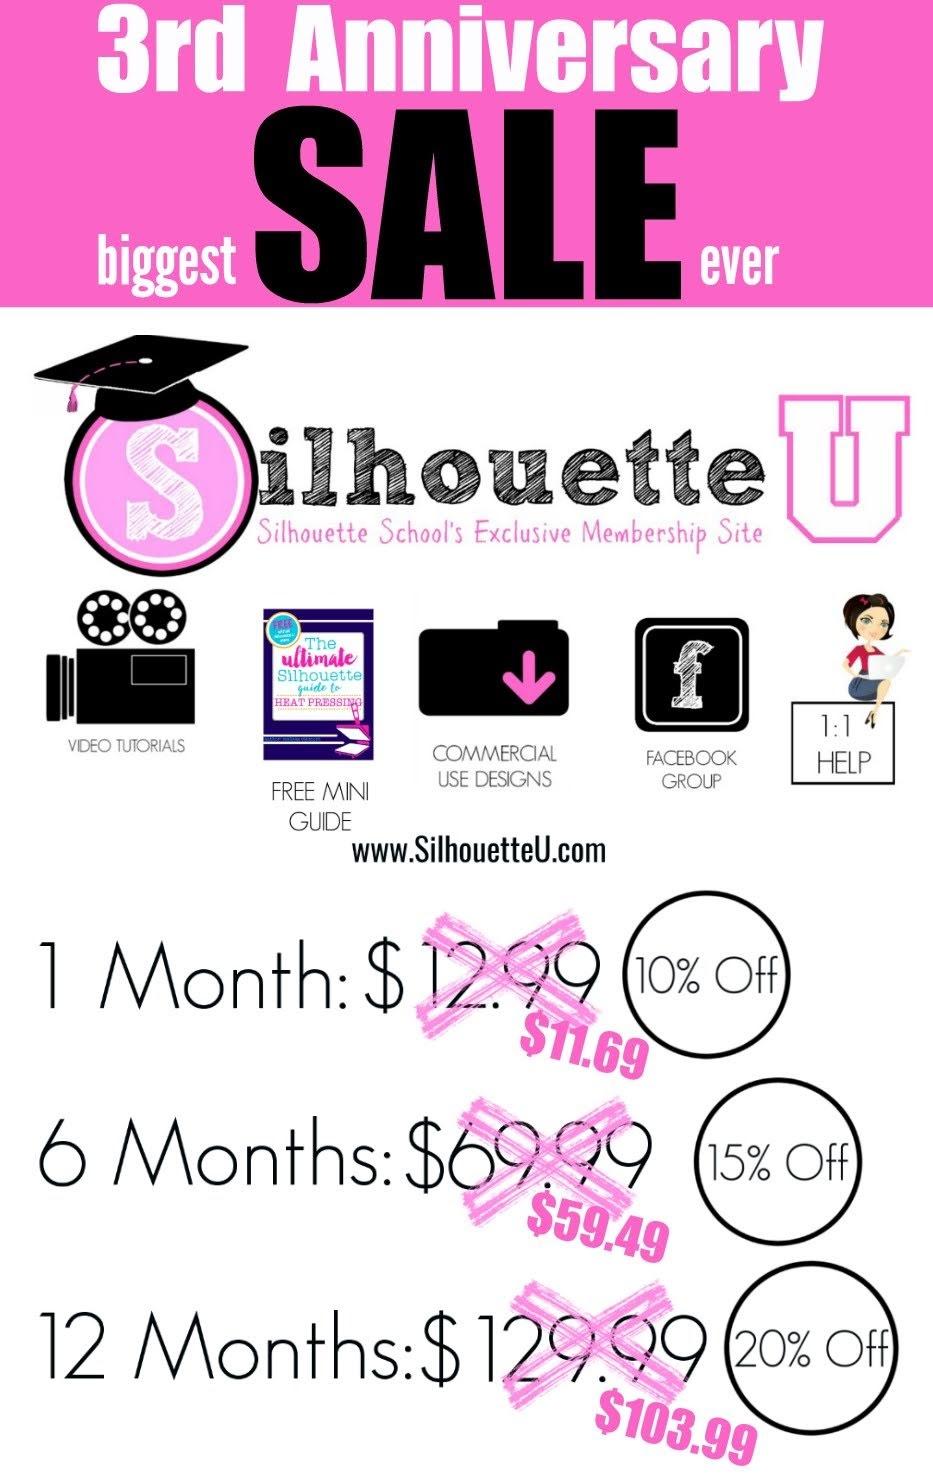 silhouette 101, silhouette america blog, silhouette u, Silhouette u promo code, silhouette university